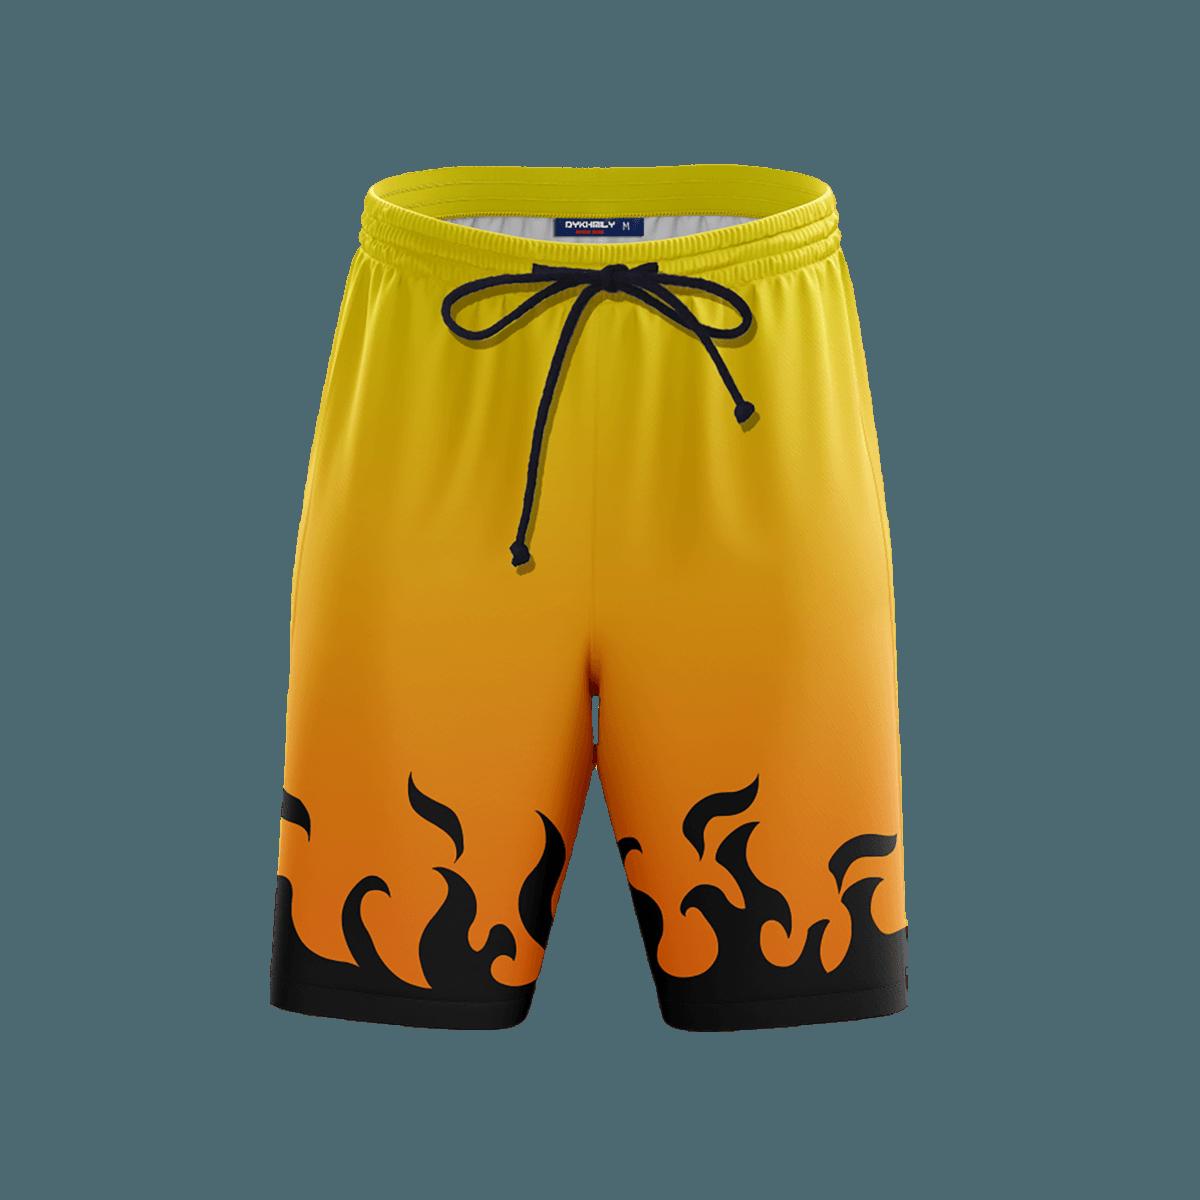 Kyuubi Chakra Beach Shorts FDM3107 S Official Anime Swimsuit Merch